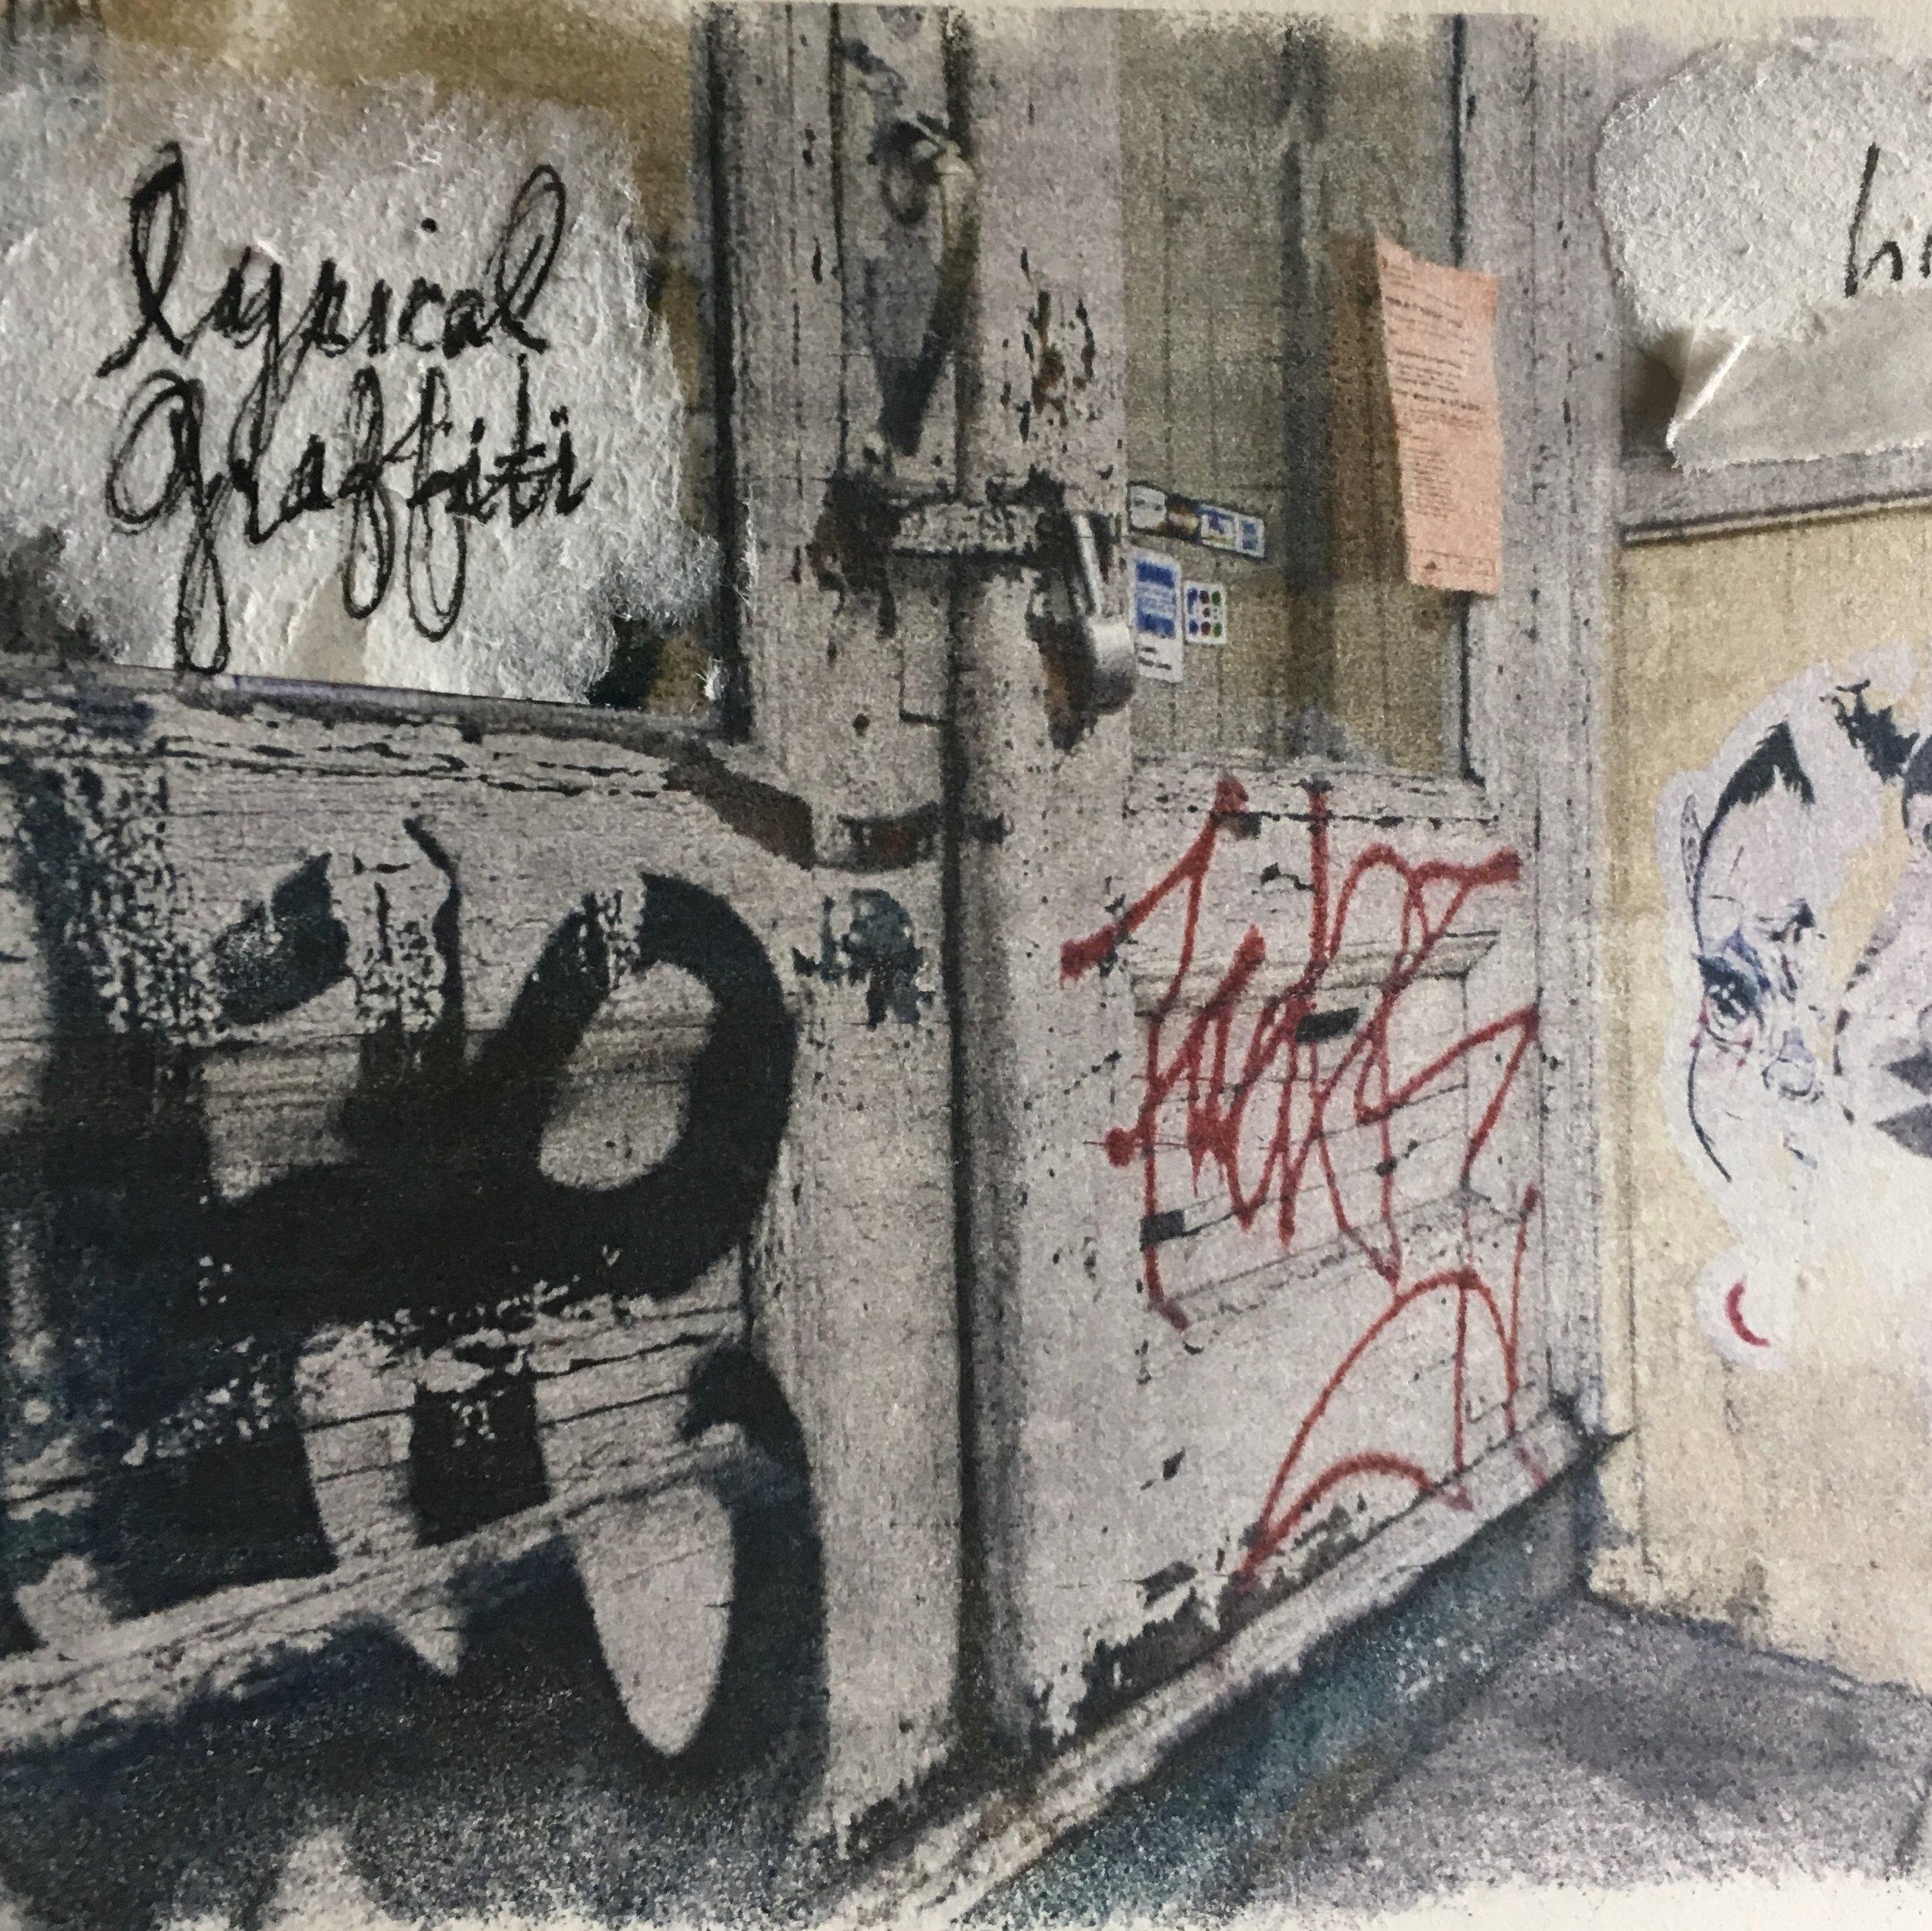 Lyrical Graffiti.jpg